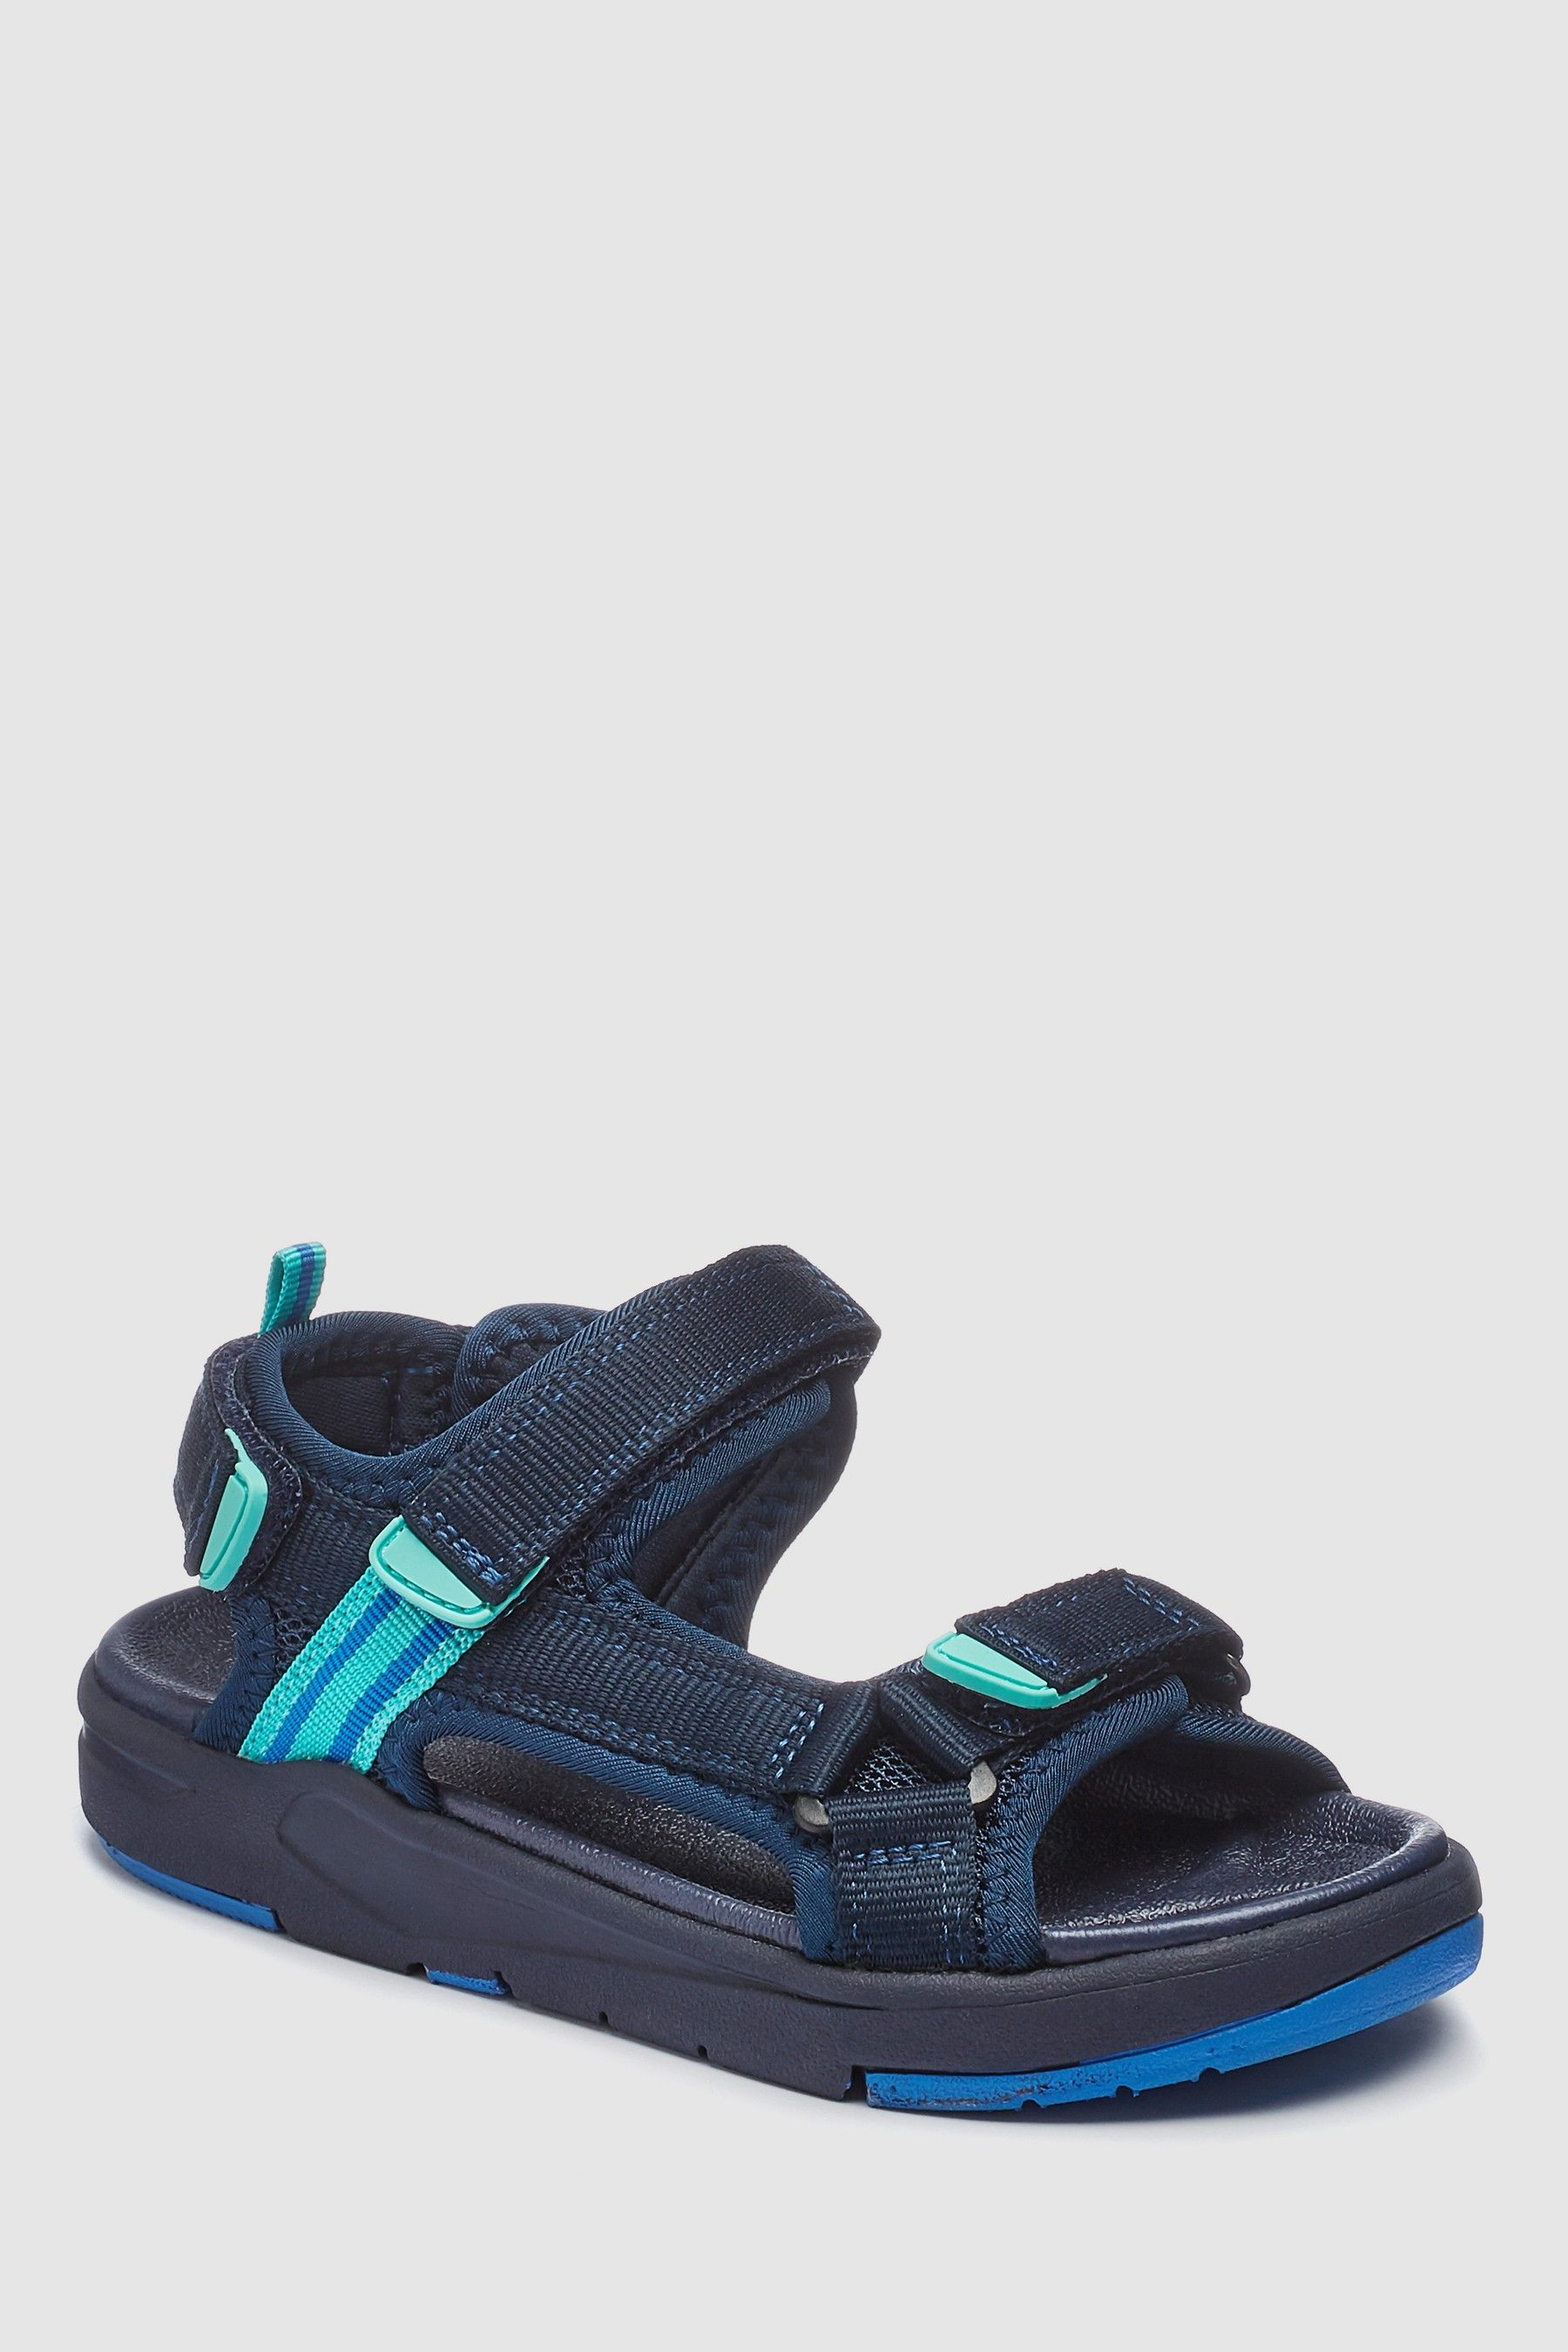 Boys Next Navy Chunky Trekker Sandals